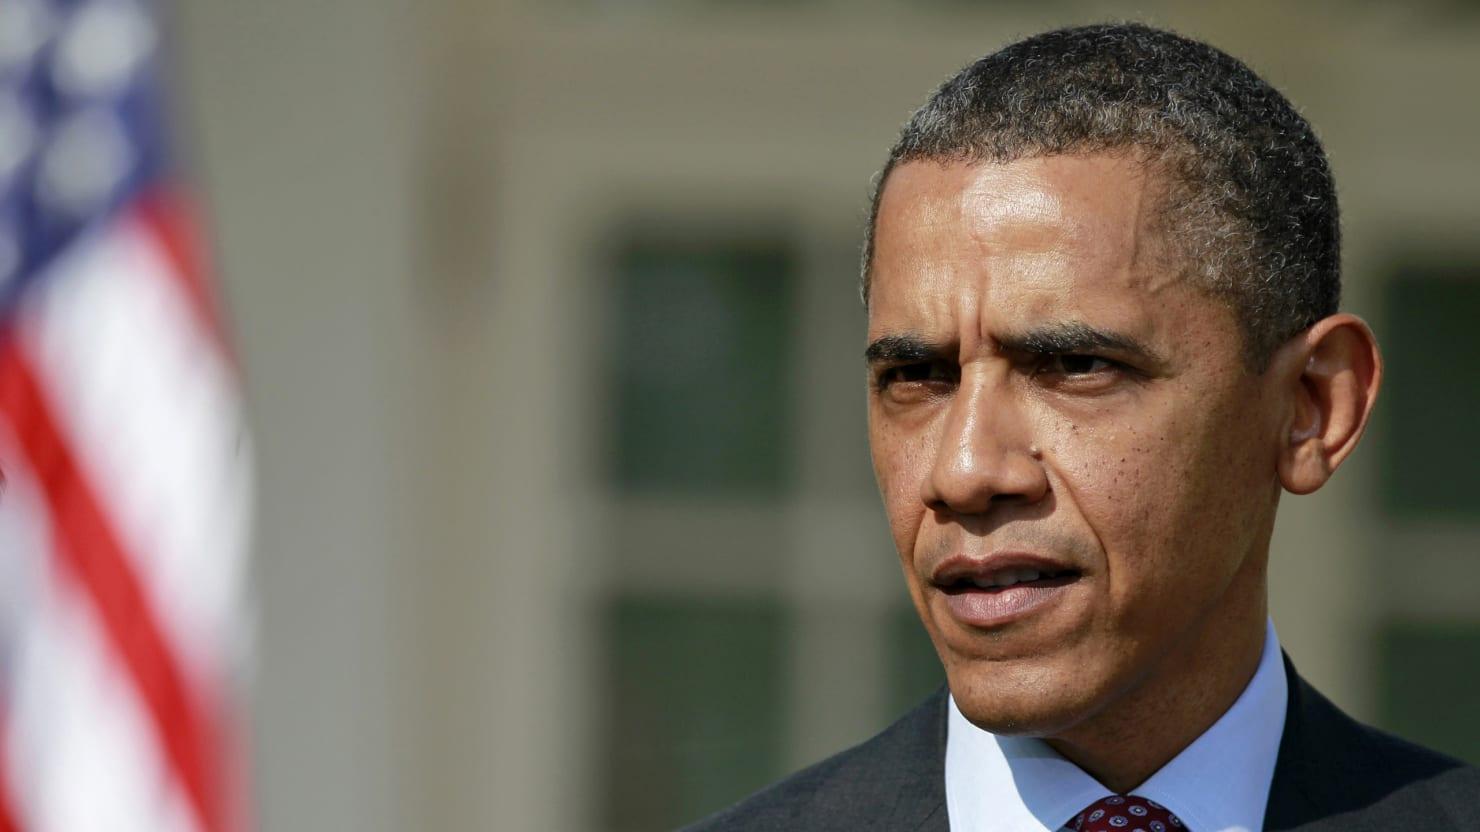 America's Regression: Under Obama, More Backlash Than Progress